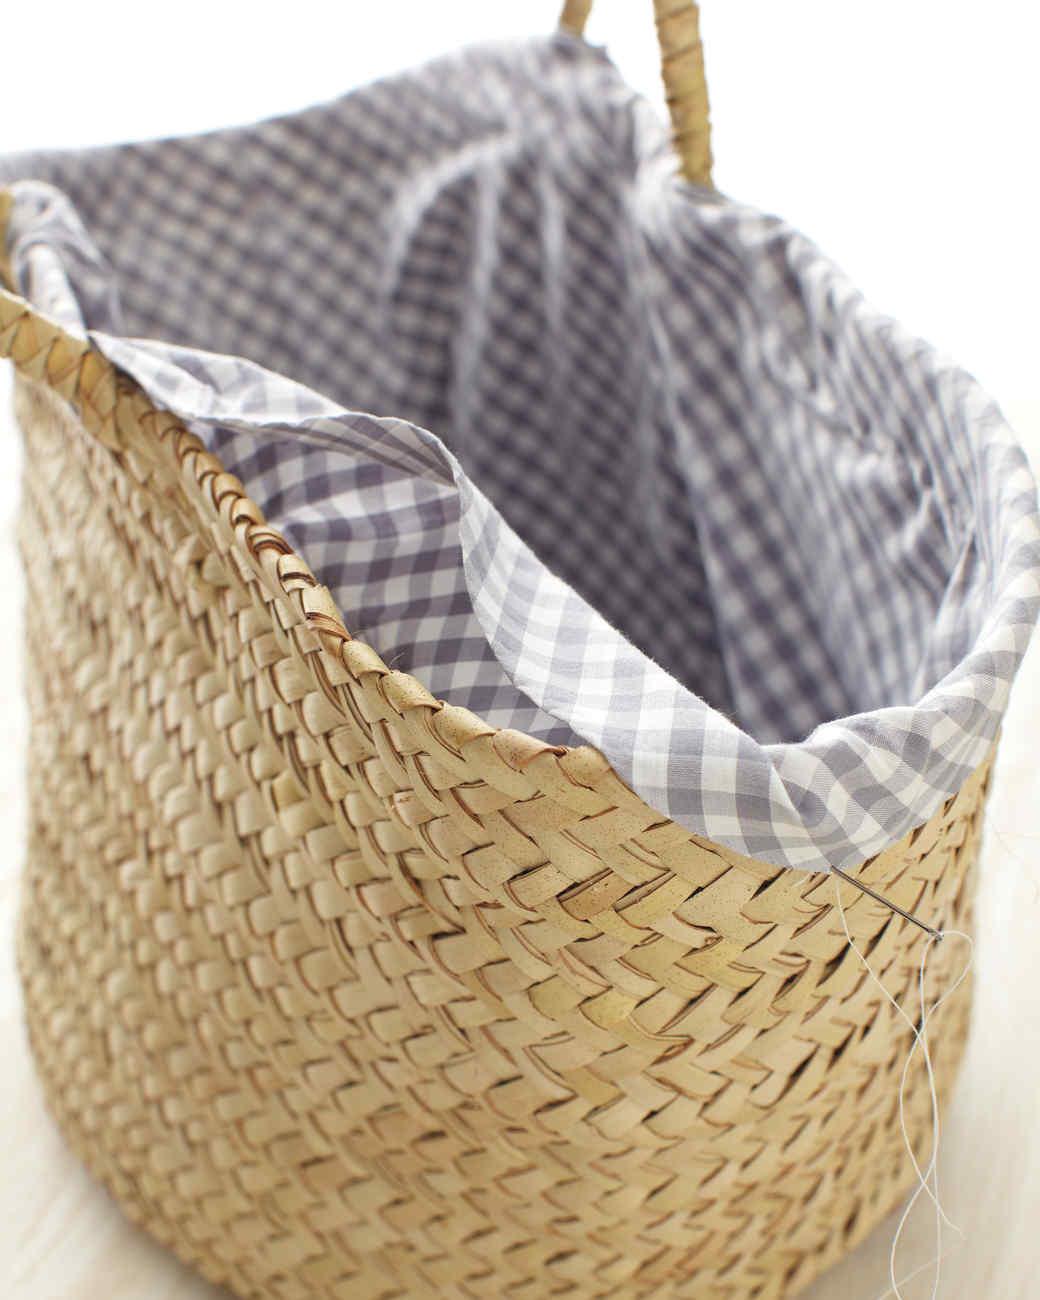 Basket Liner How-To